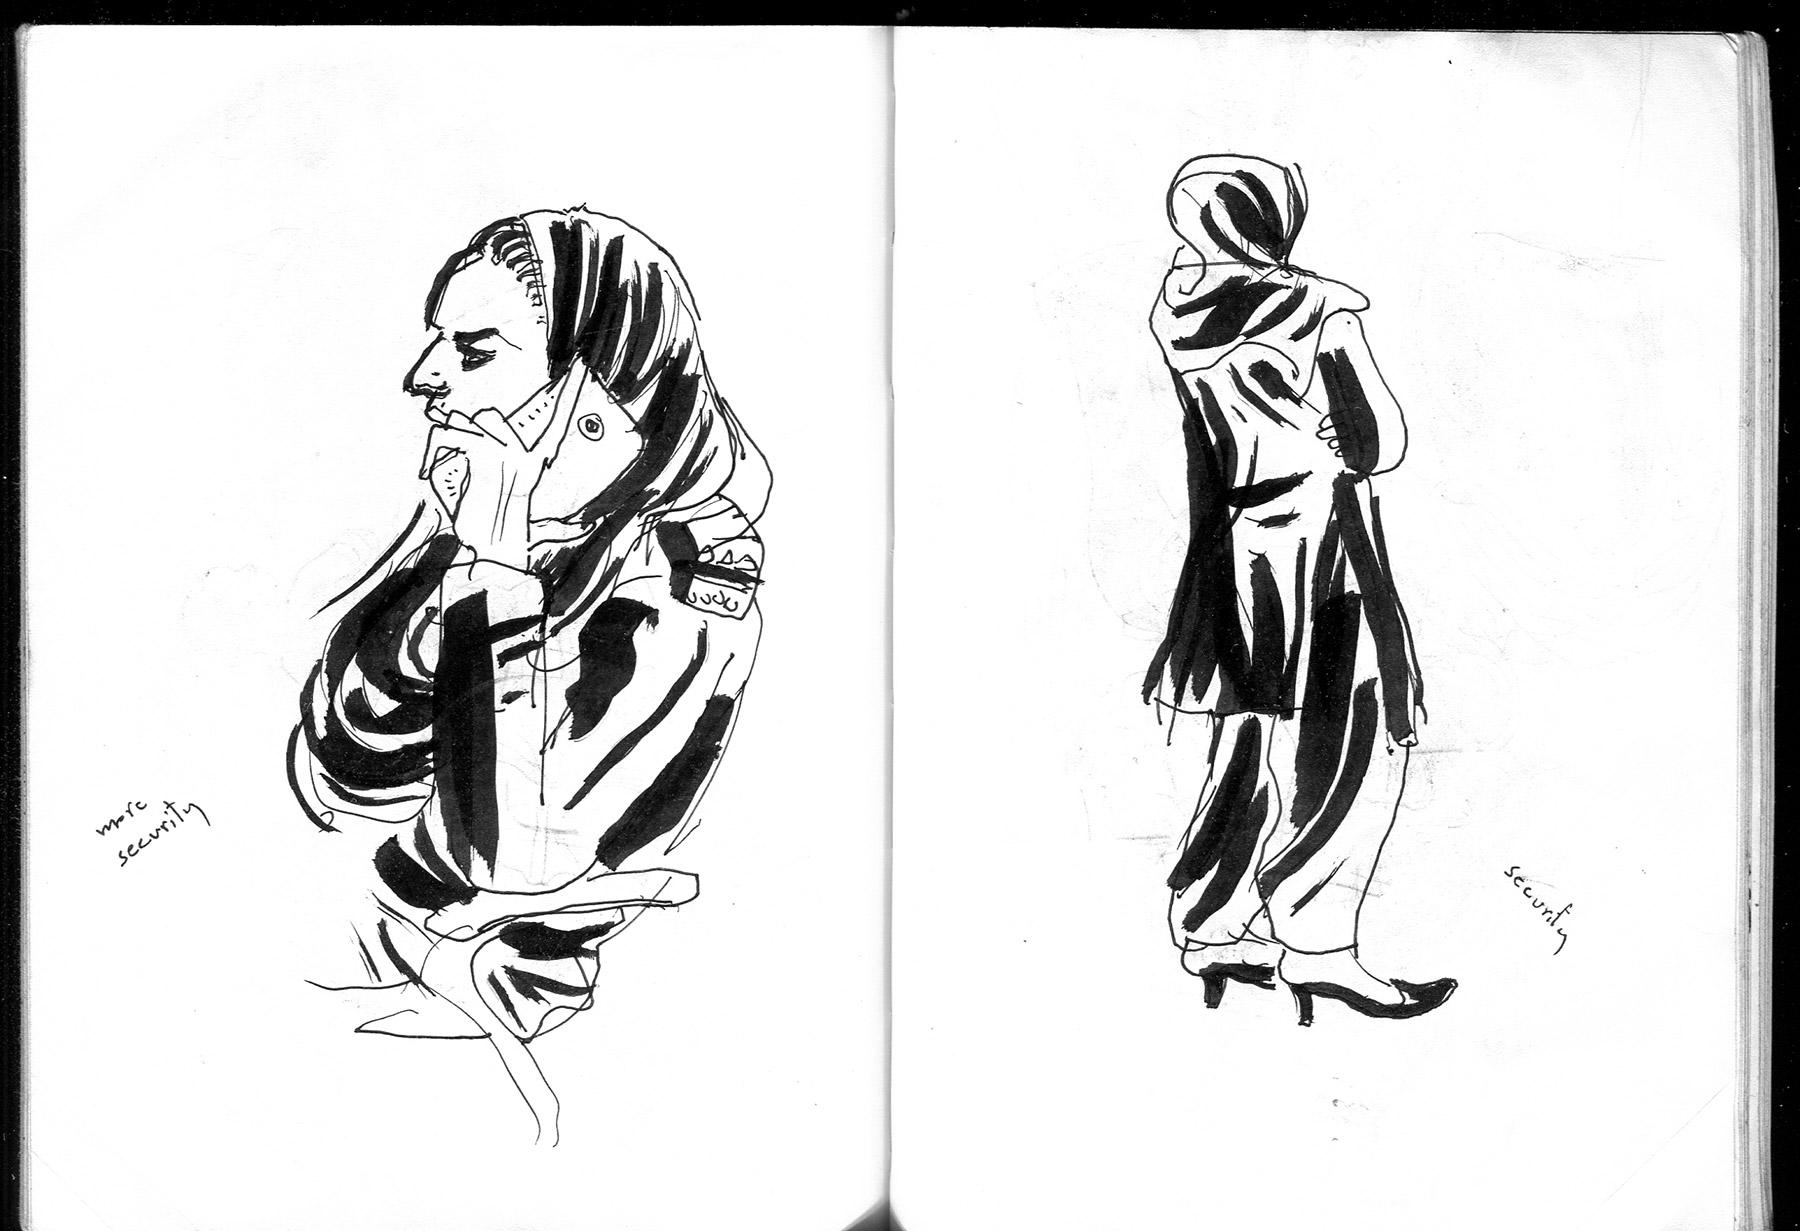 davidm_sketches_2014_08-016.jpg